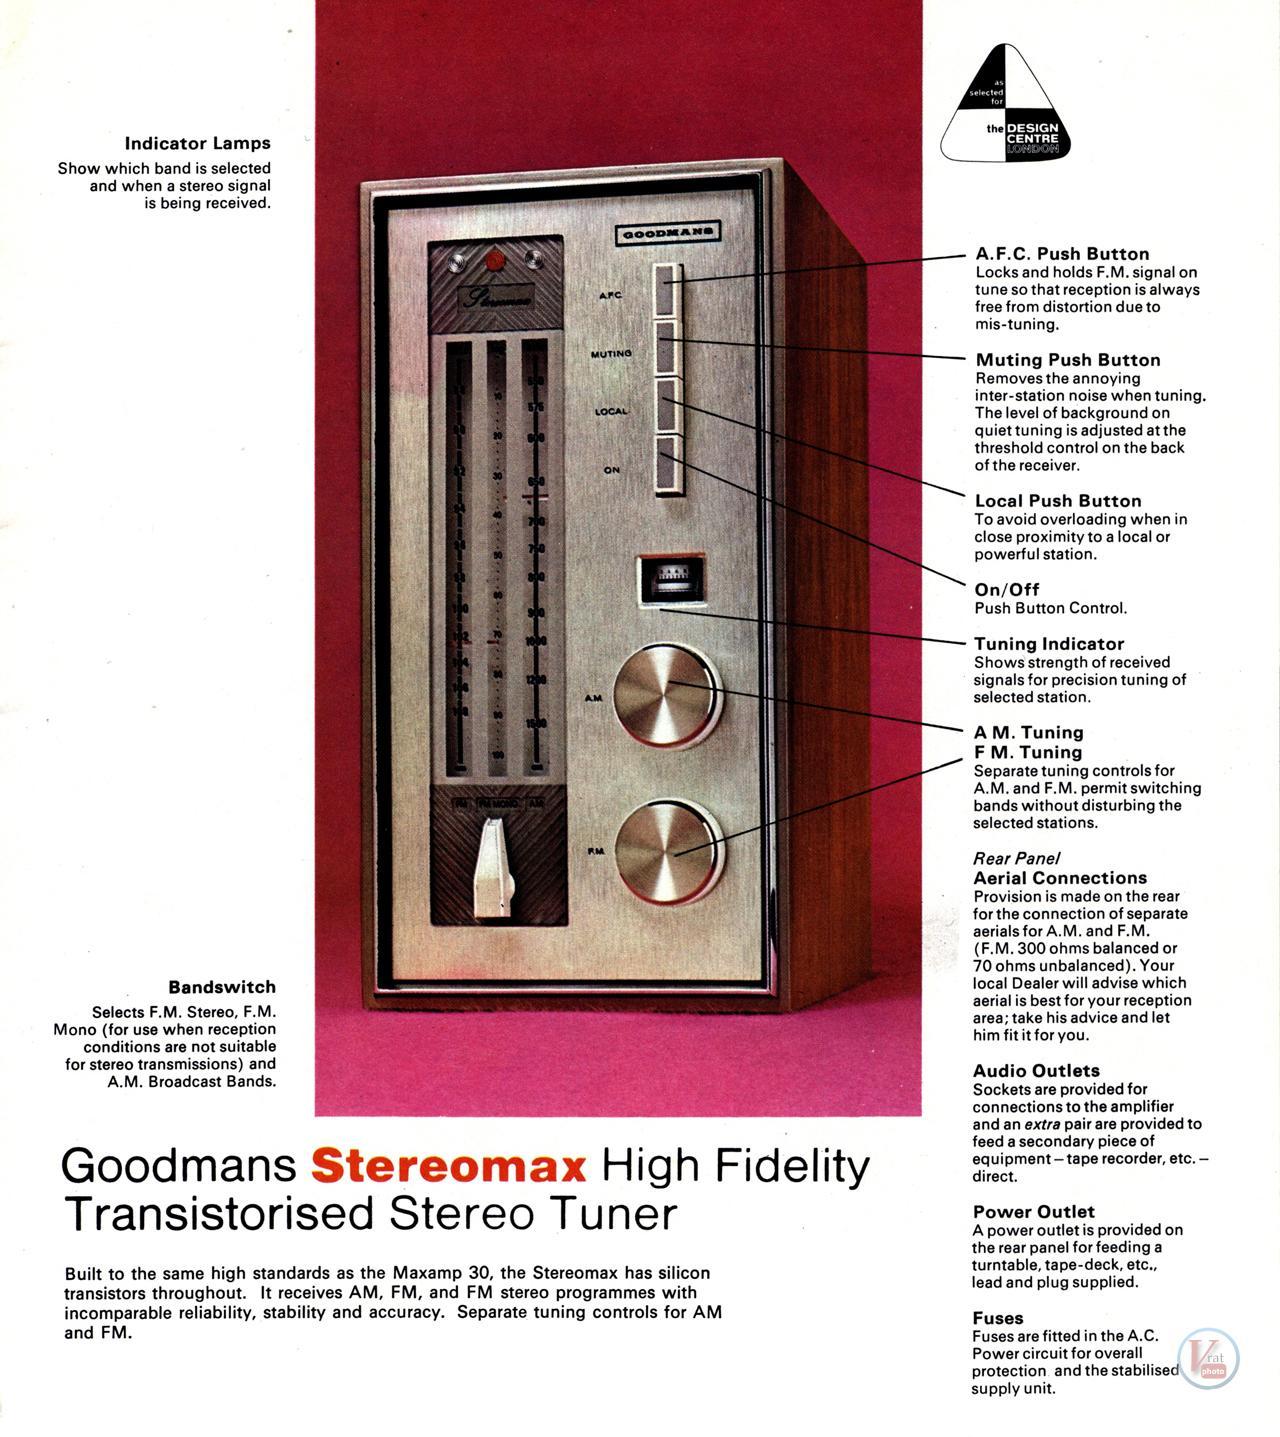 Goodmans StereoMax 11